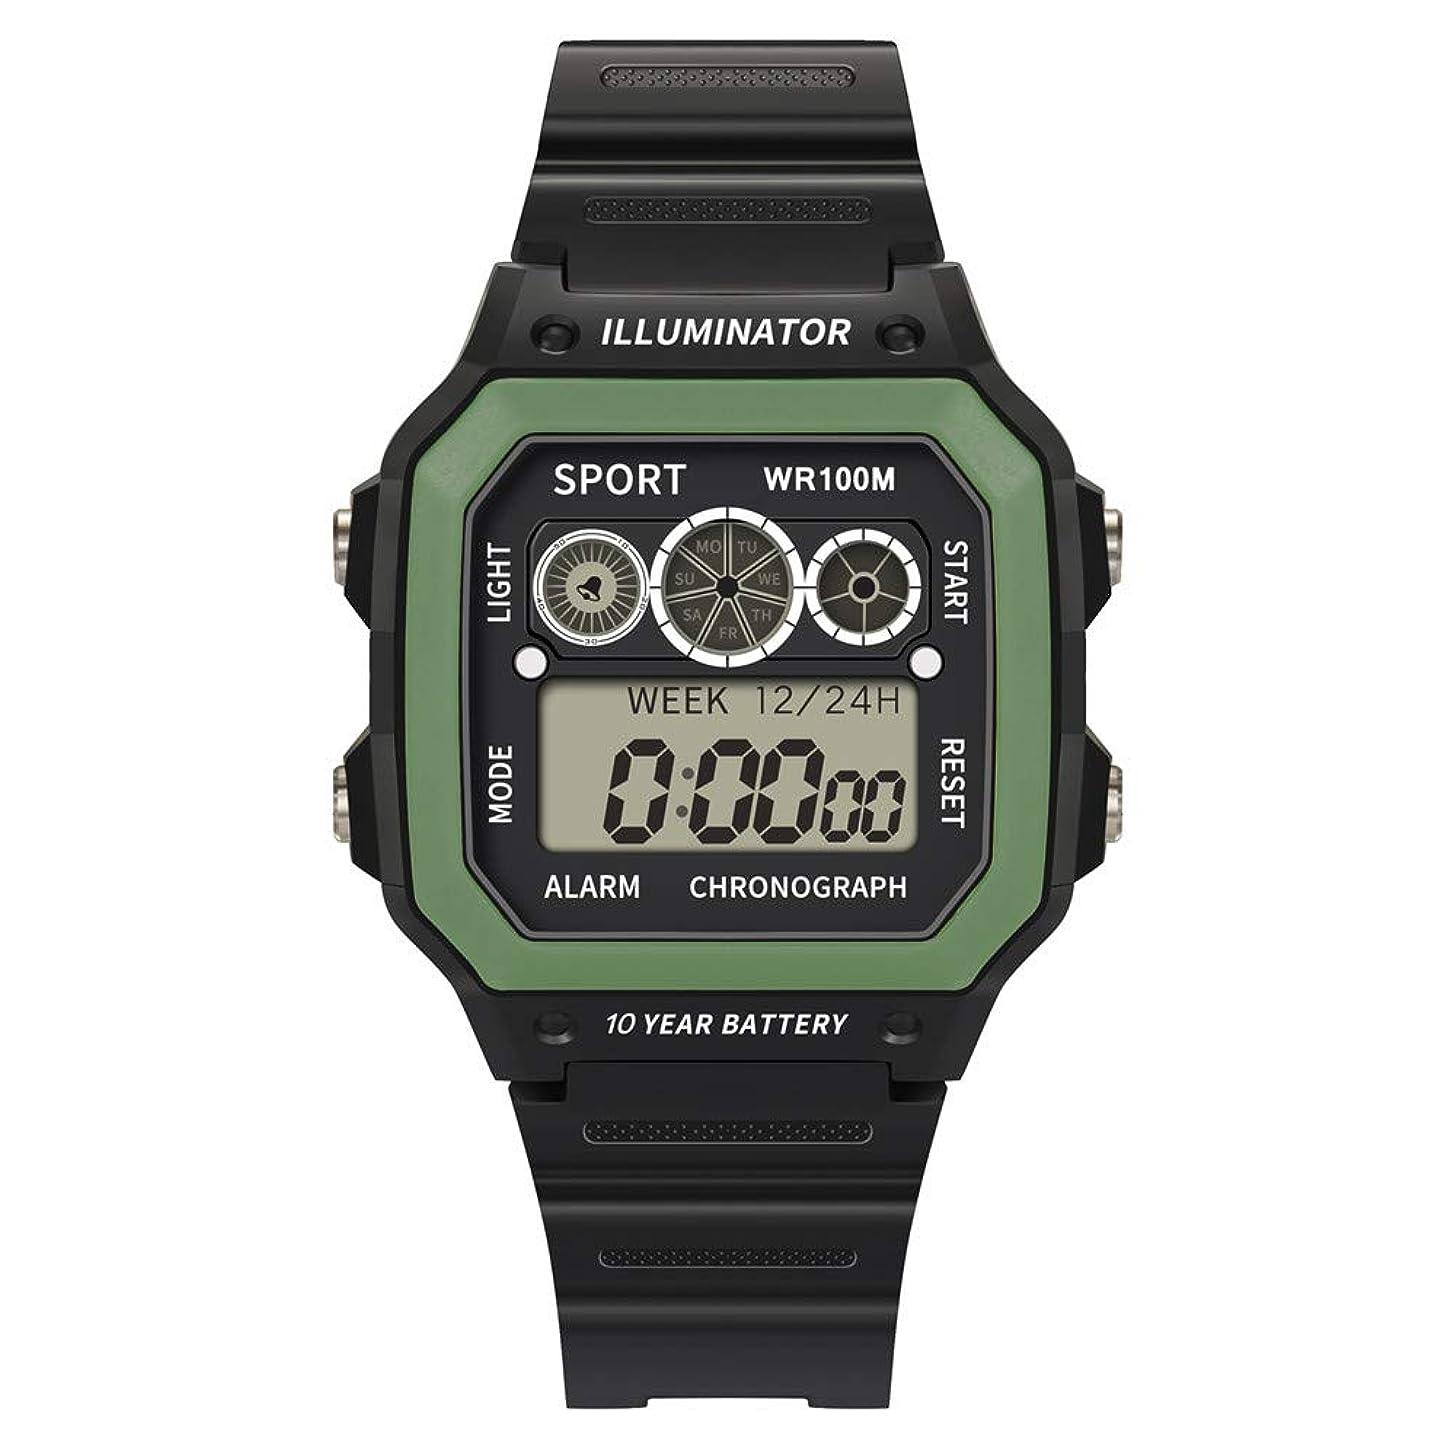 Guartz Watches for Men Digital Under 10 Dollars ? Luxury Men Analog Digital Military Sport LED Waterproof Wrist Watch